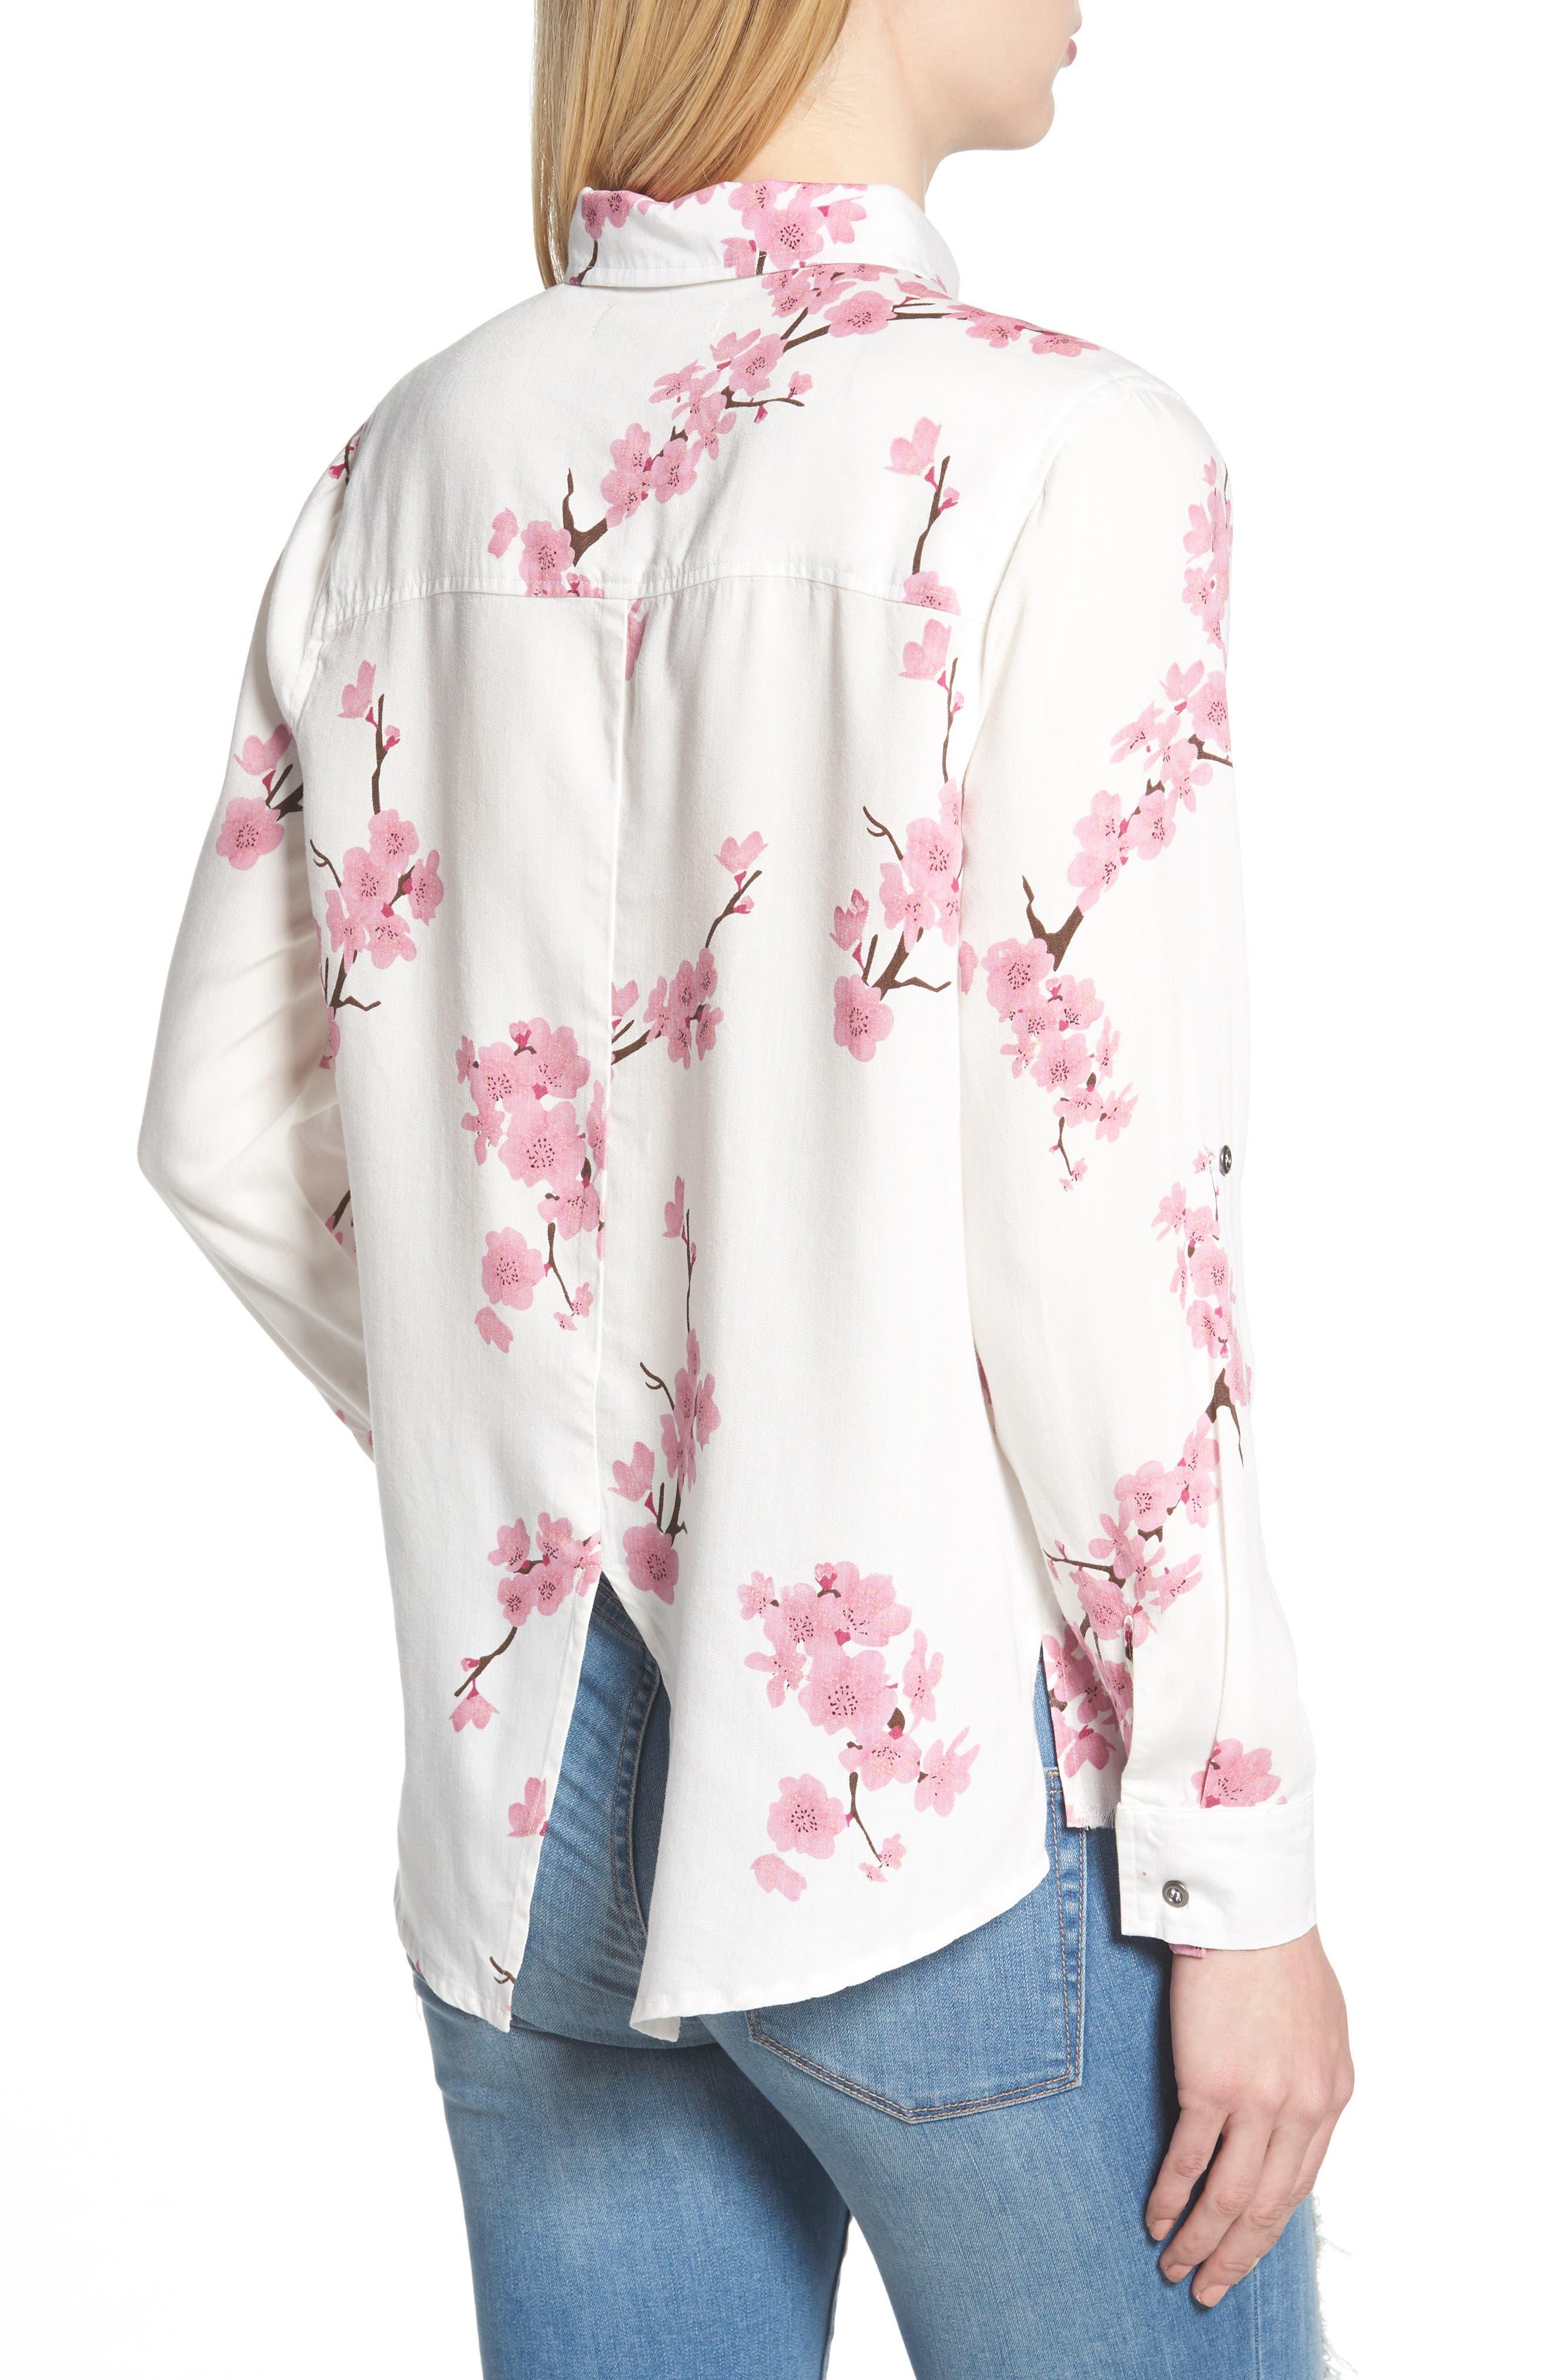 Cherry Blossom Roll Tab Sleeve Shirt,                             Alternate thumbnail 2, color,                             White Cherry Blossom